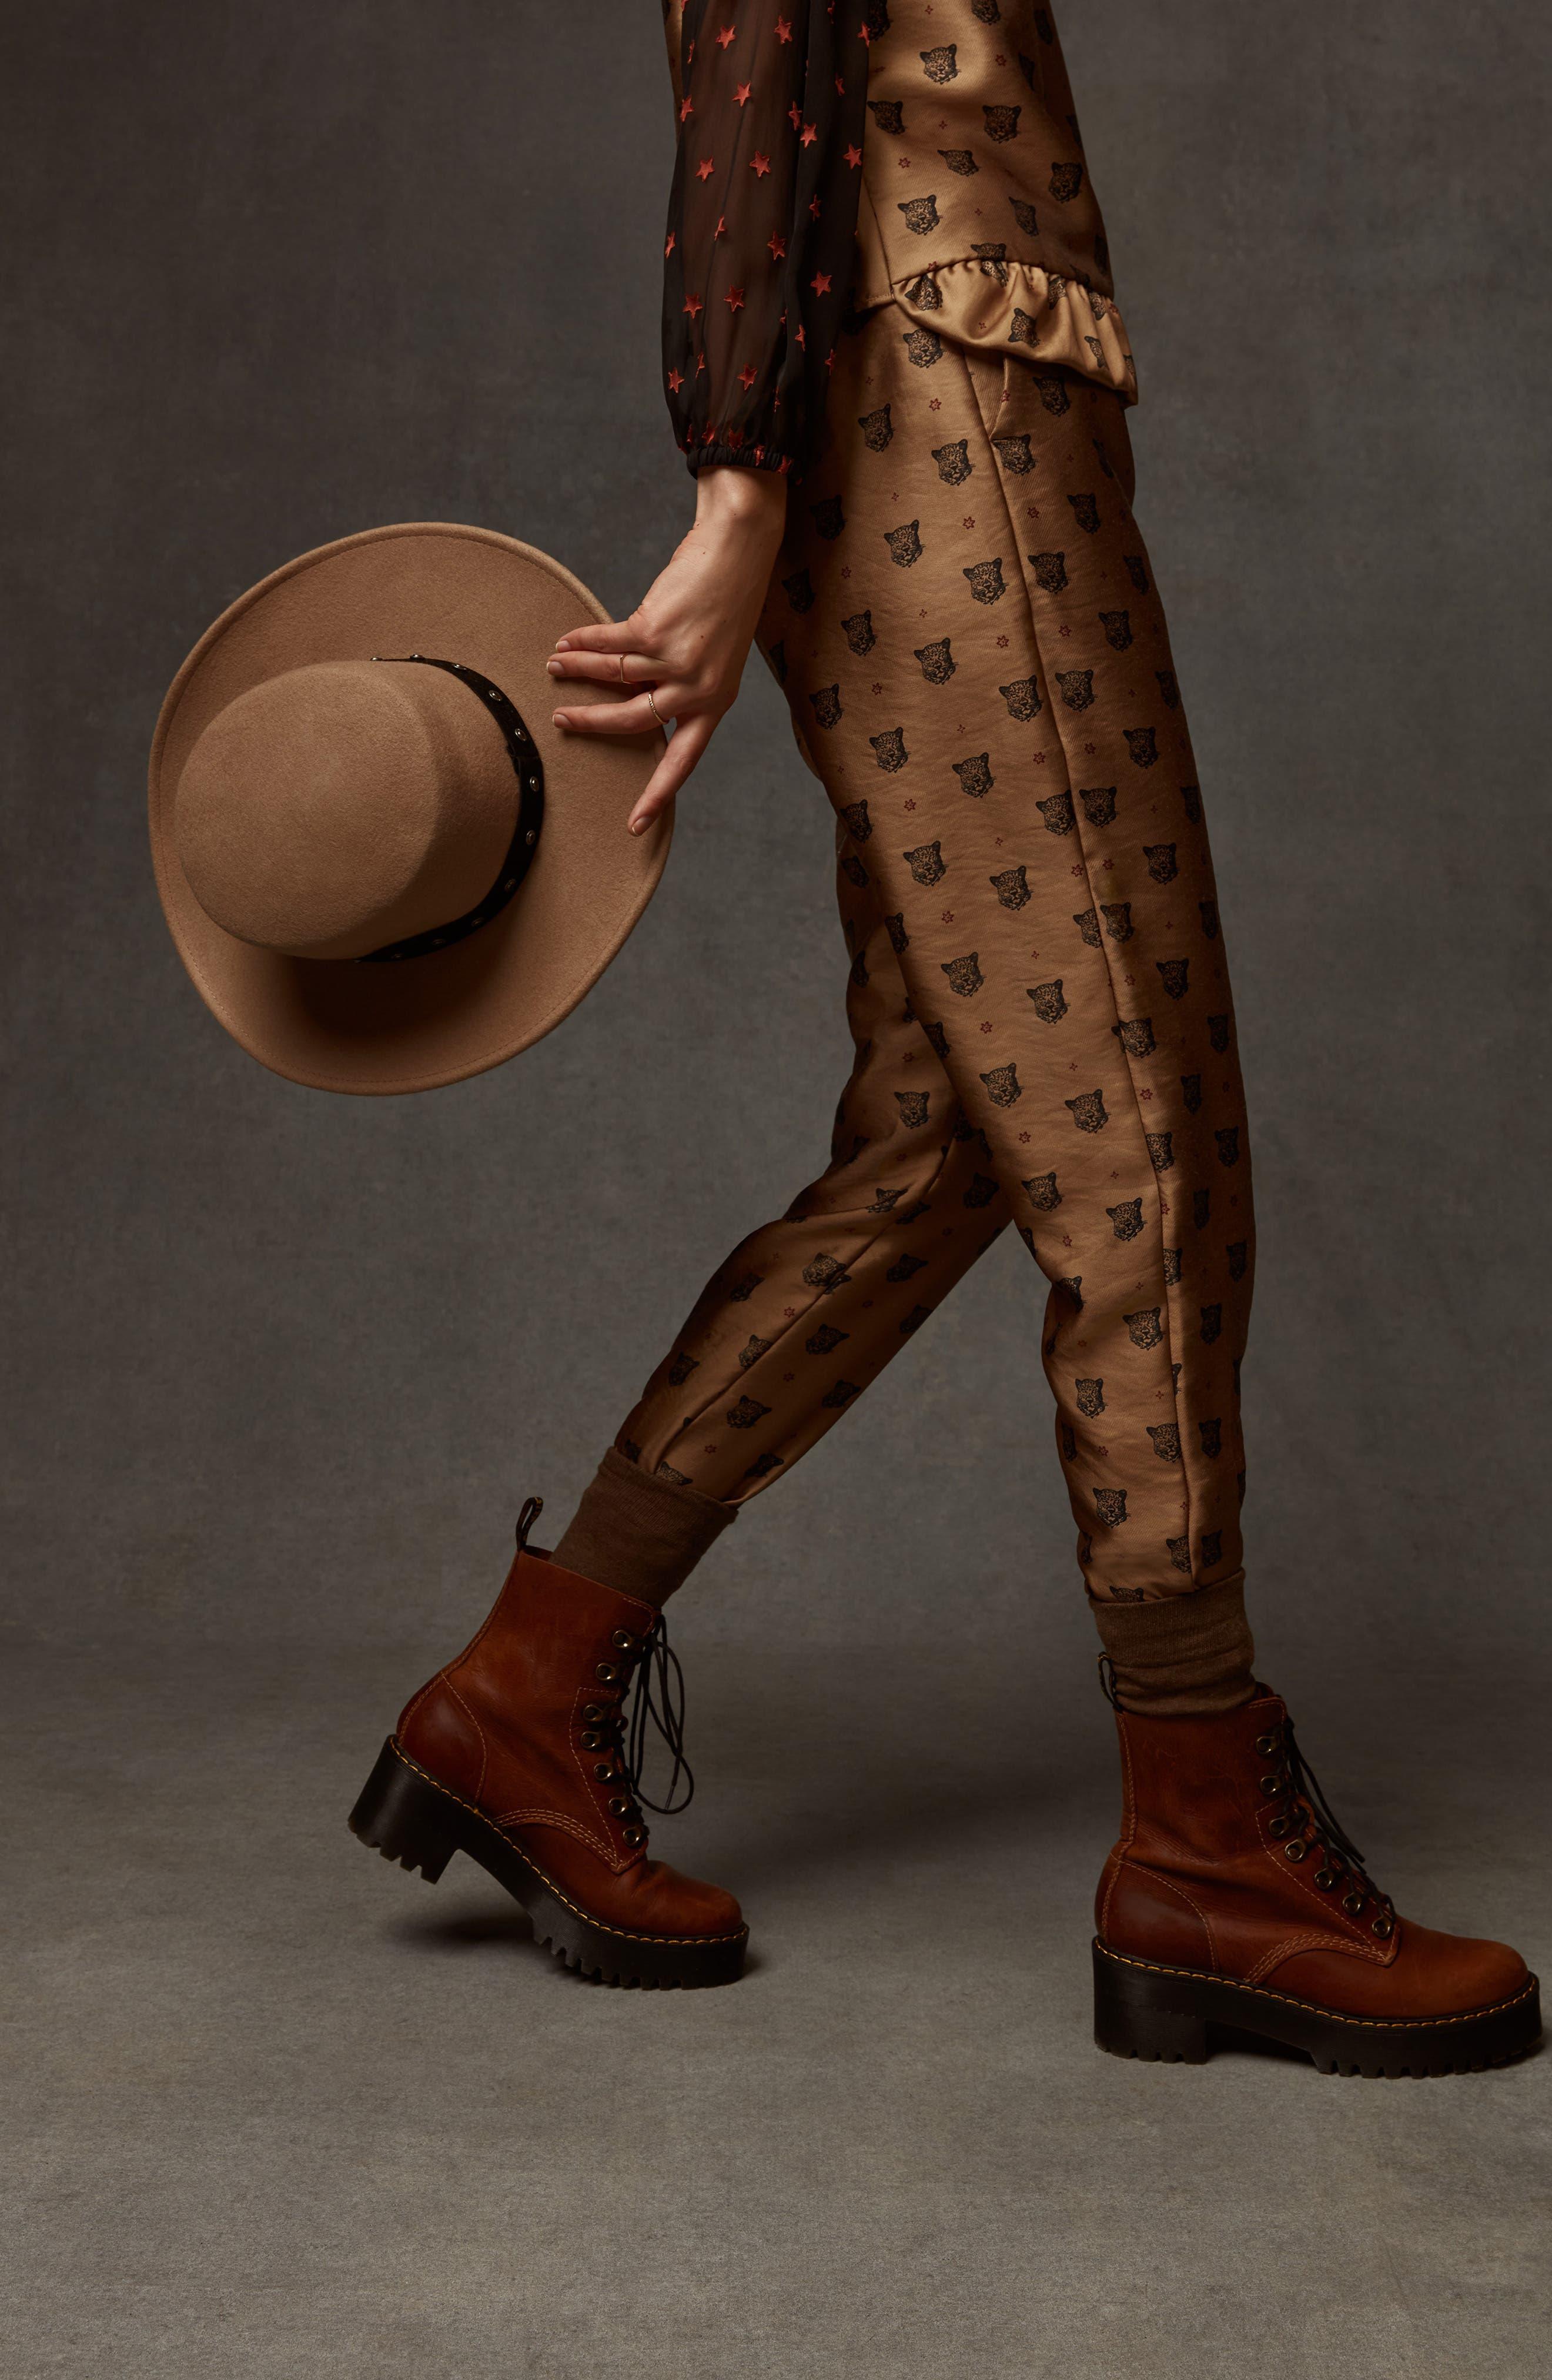 Tailored Leopard Pants,                             Alternate thumbnail 6, color,                             GOLD W/ LEOPARD PRINT